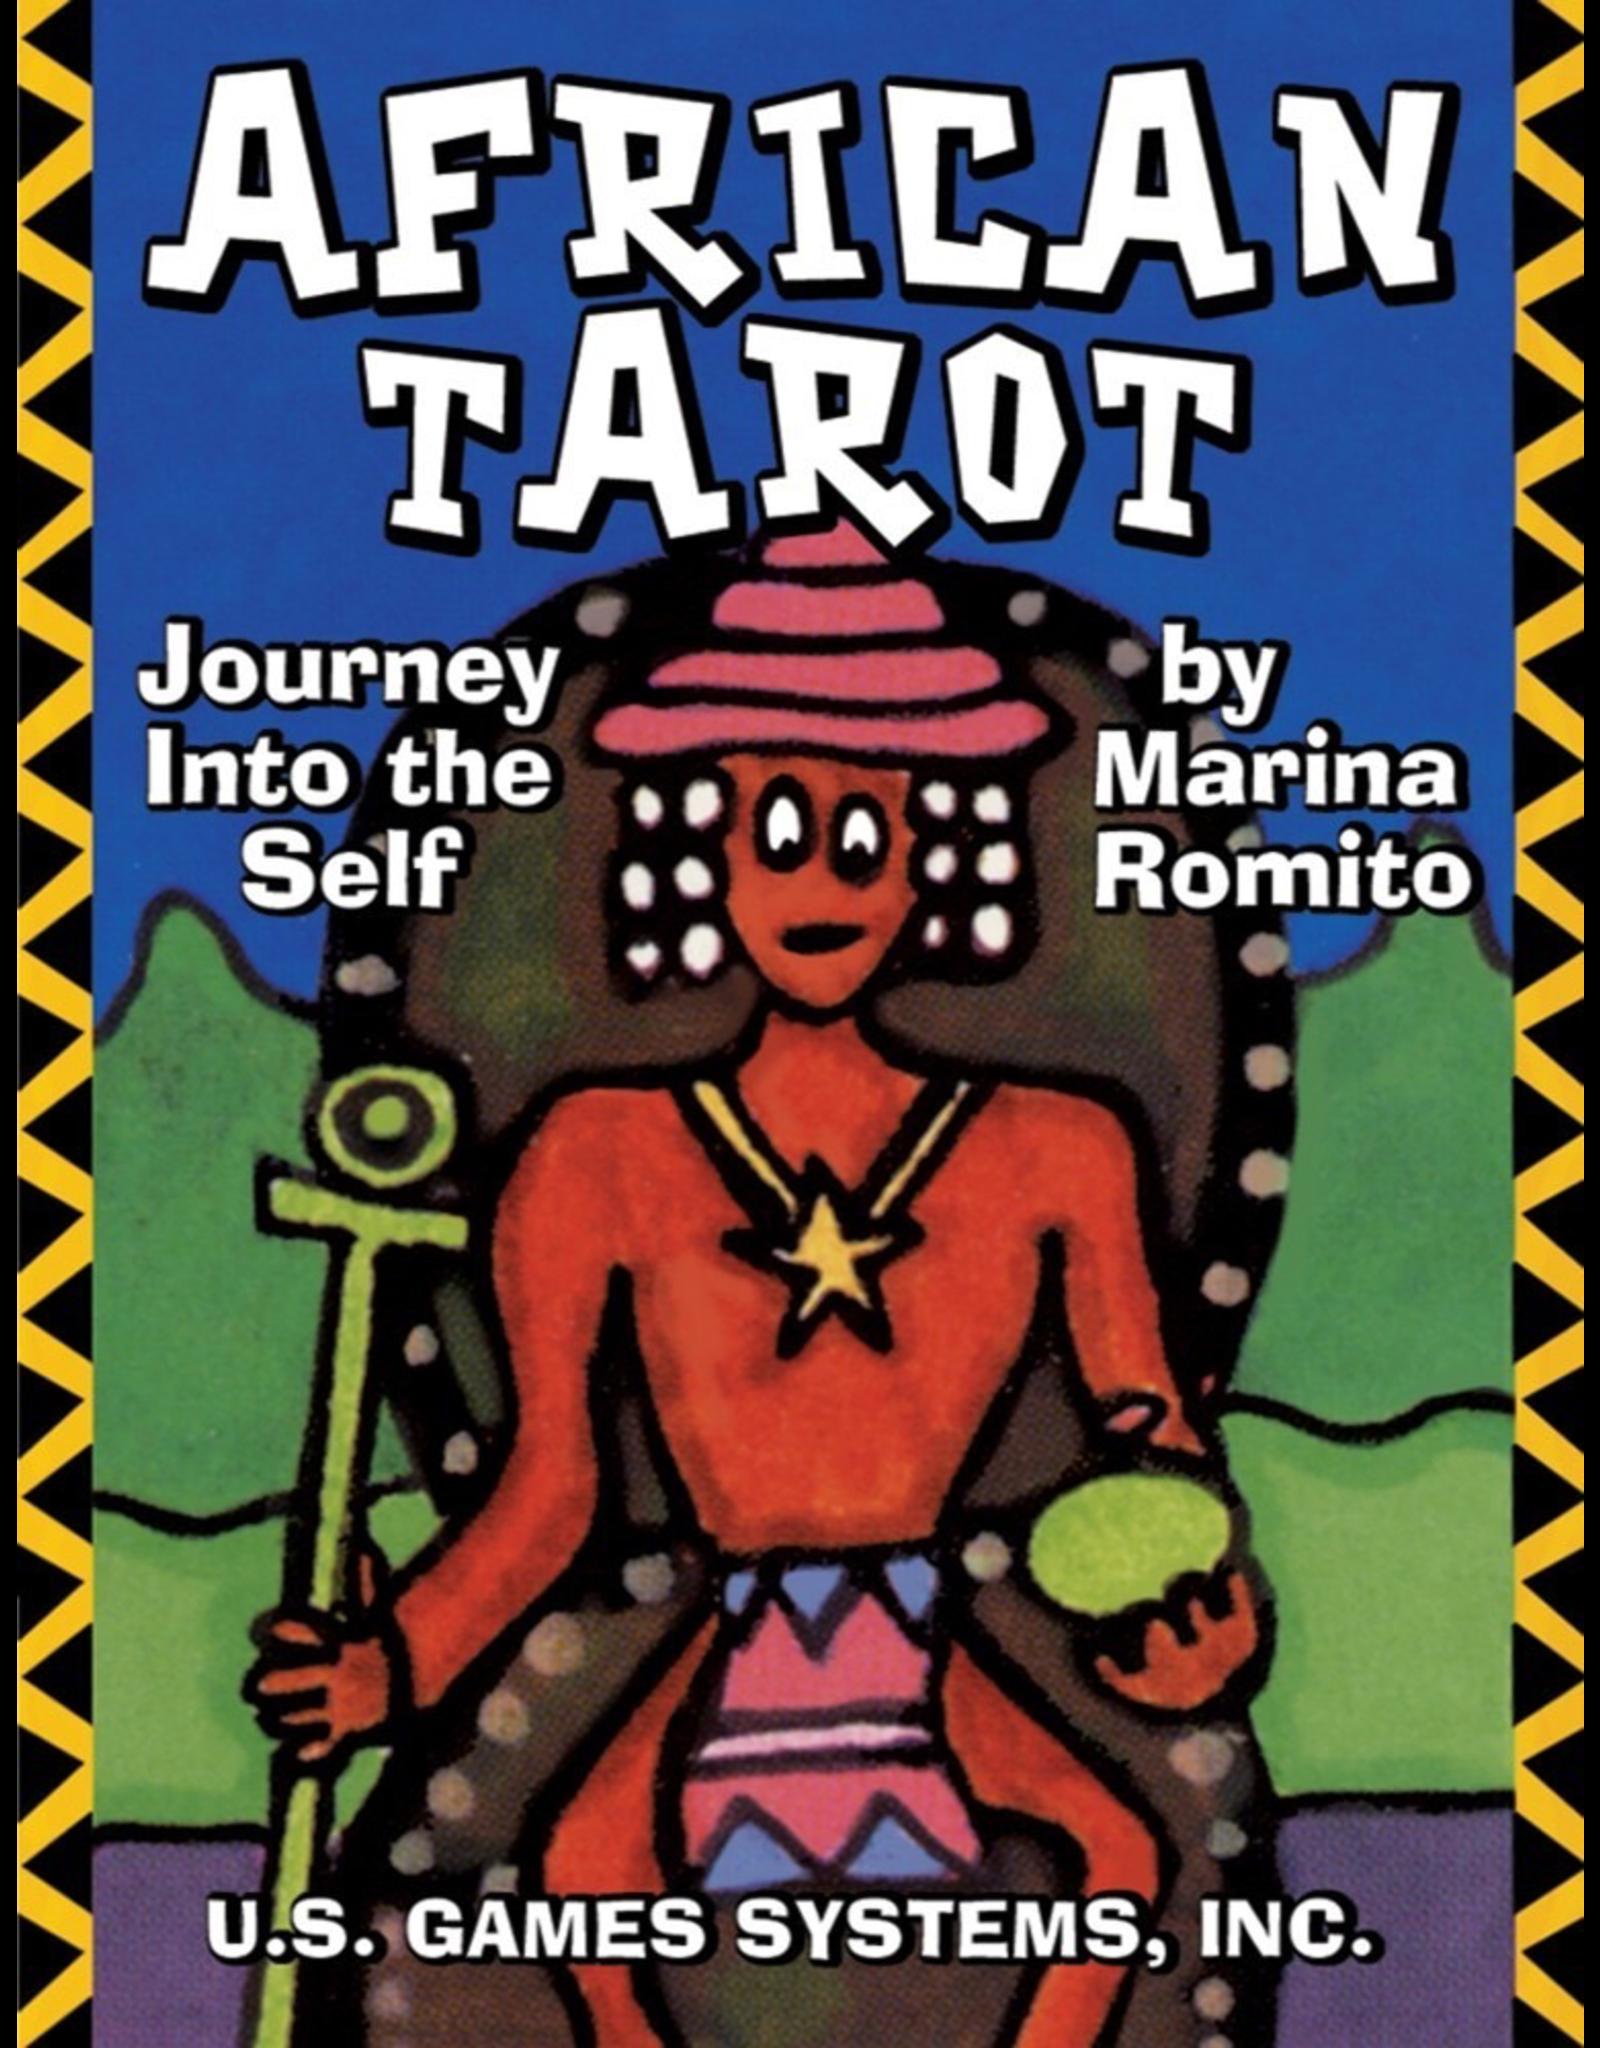 African Tarot